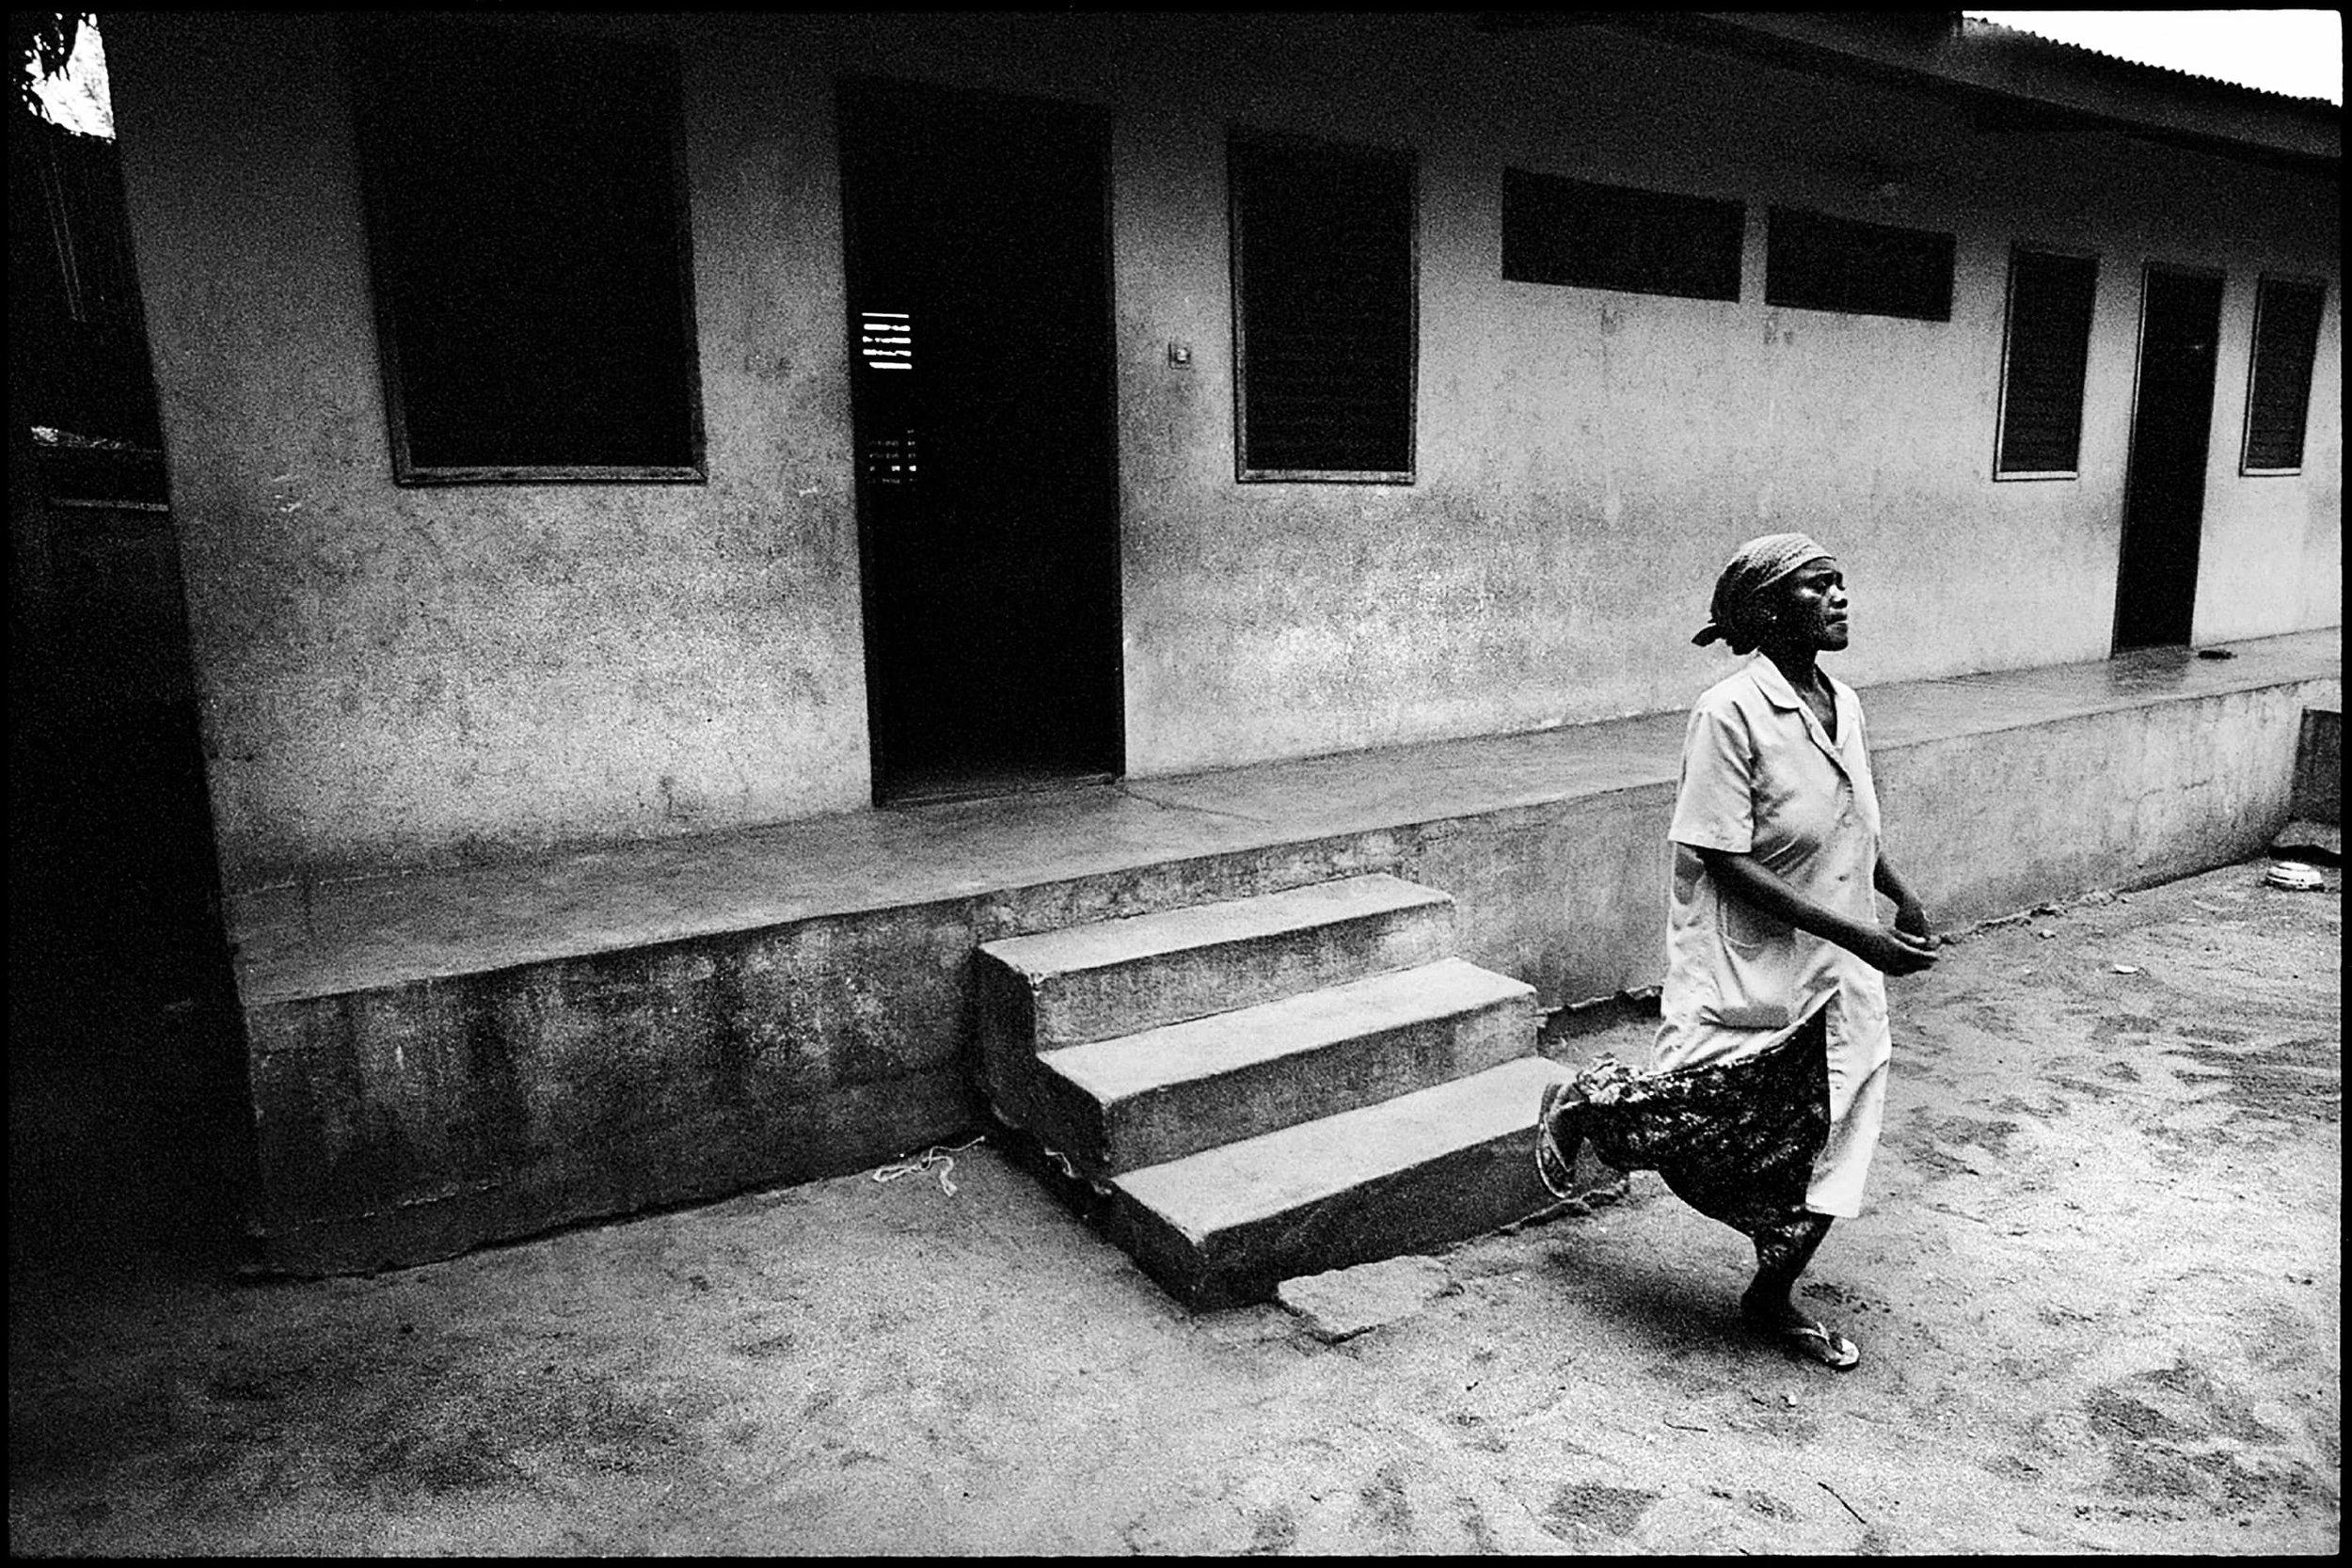 documentary-reportage-centre-les-archanges-fabio-burrelli-12.jpg